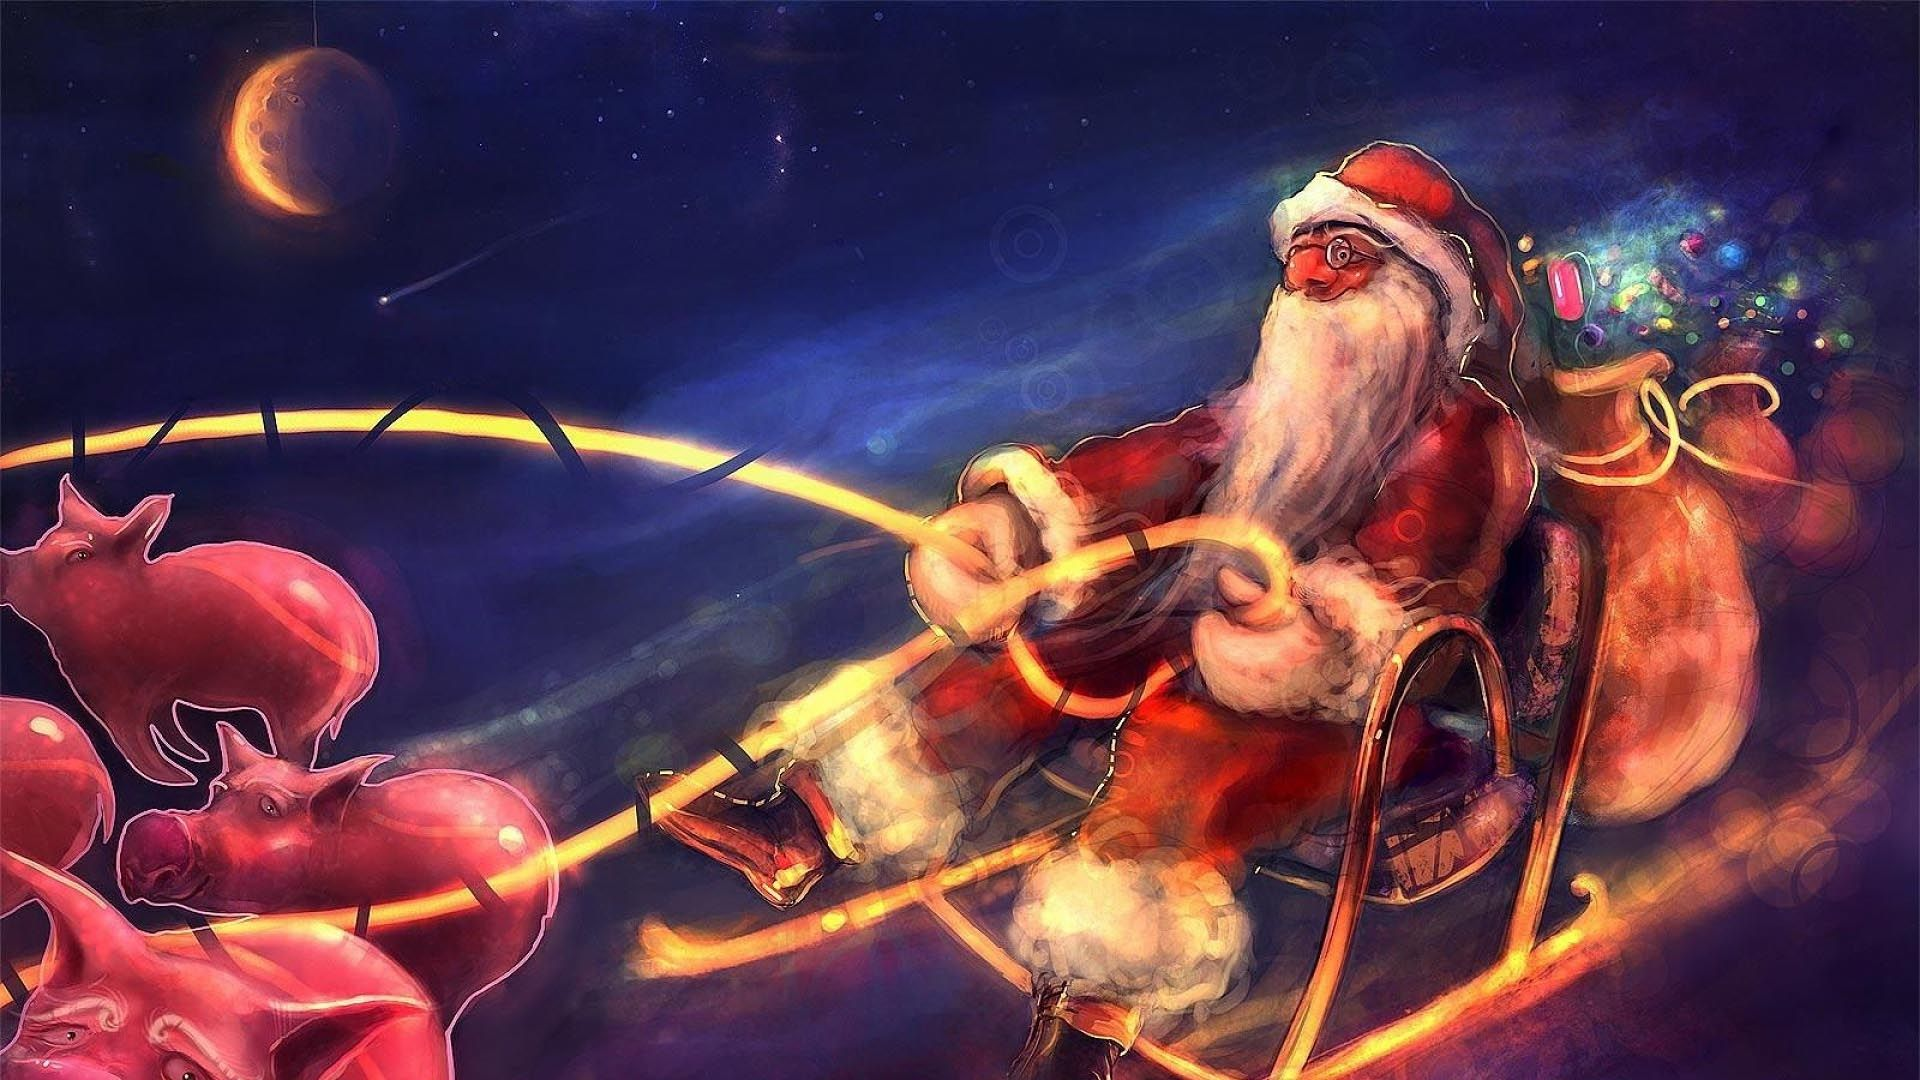 Christmas Sleigh full hd 1080p wallpaper